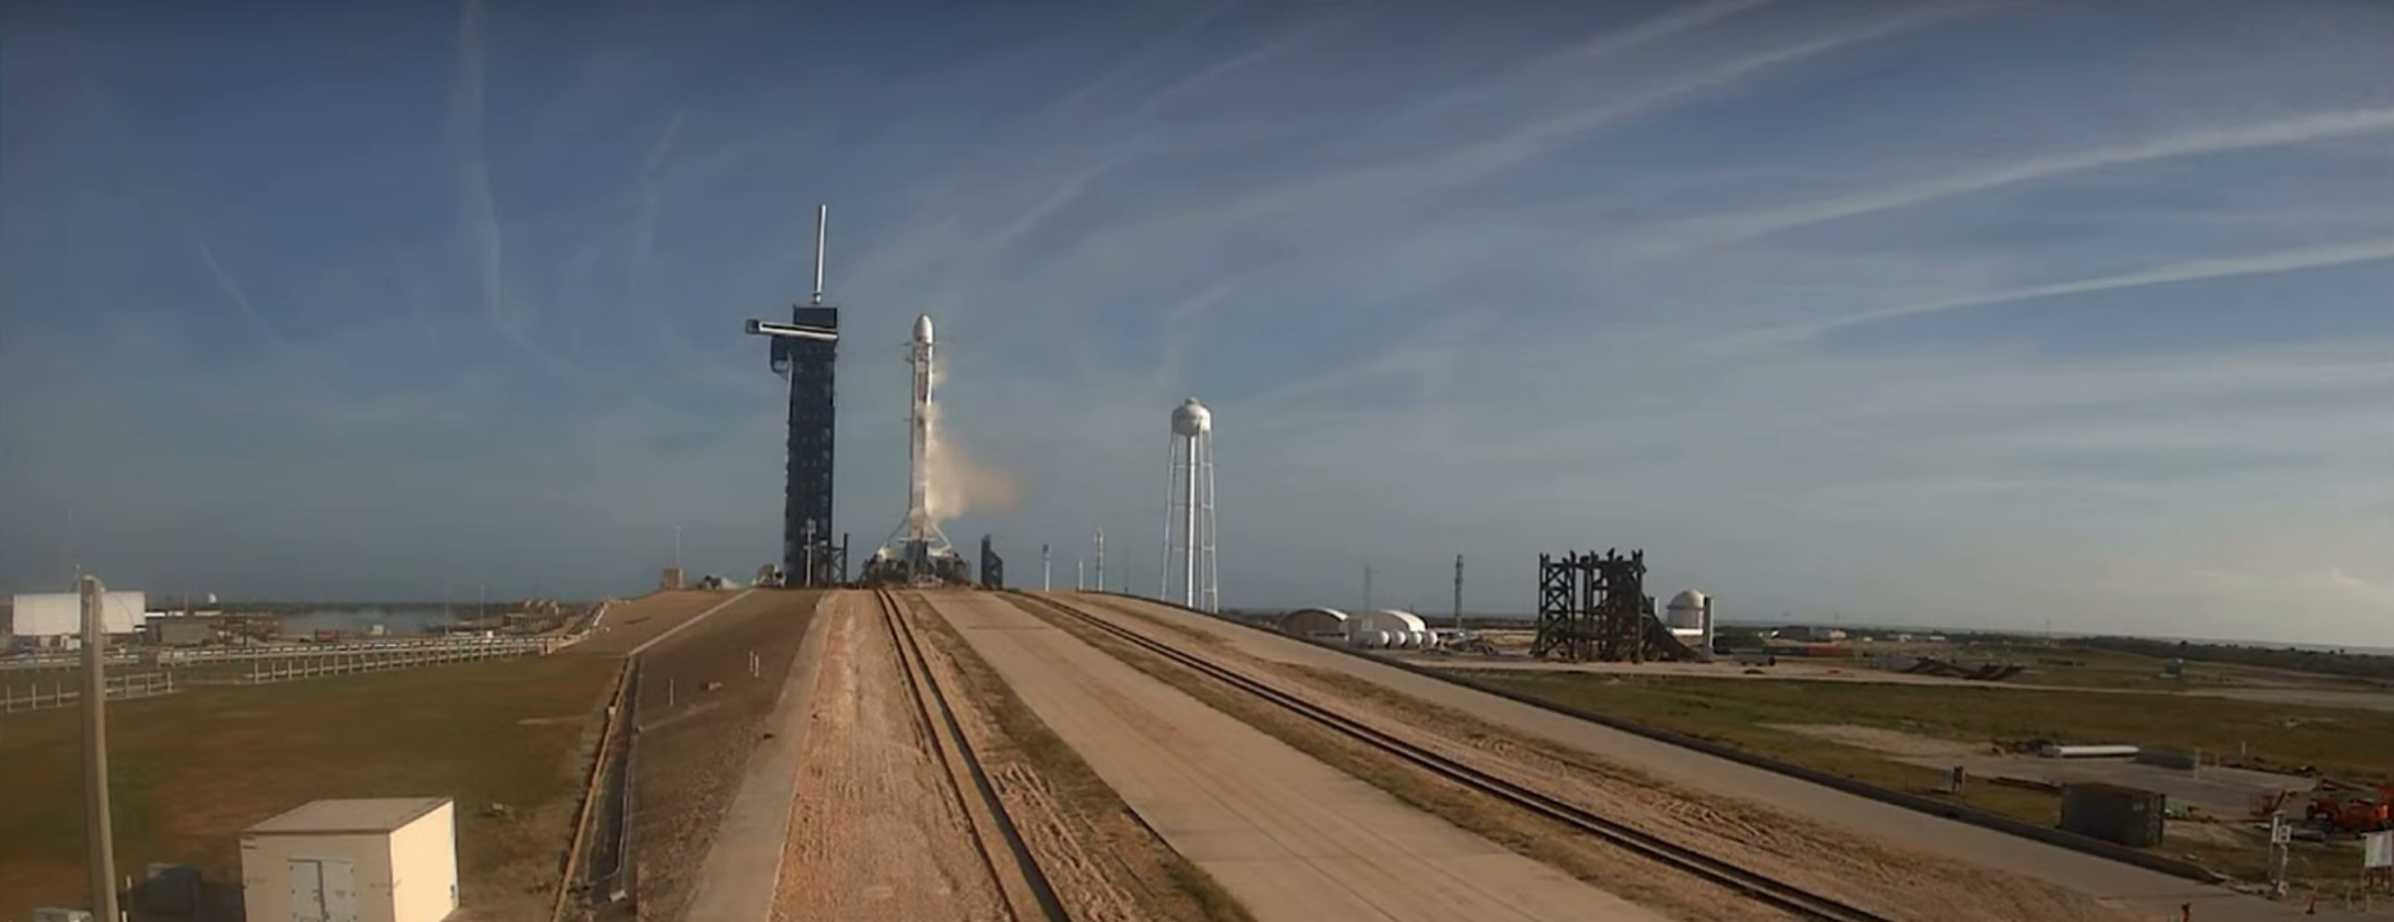 Starlink V1 L5 webcast (SpaceX) (2) crop